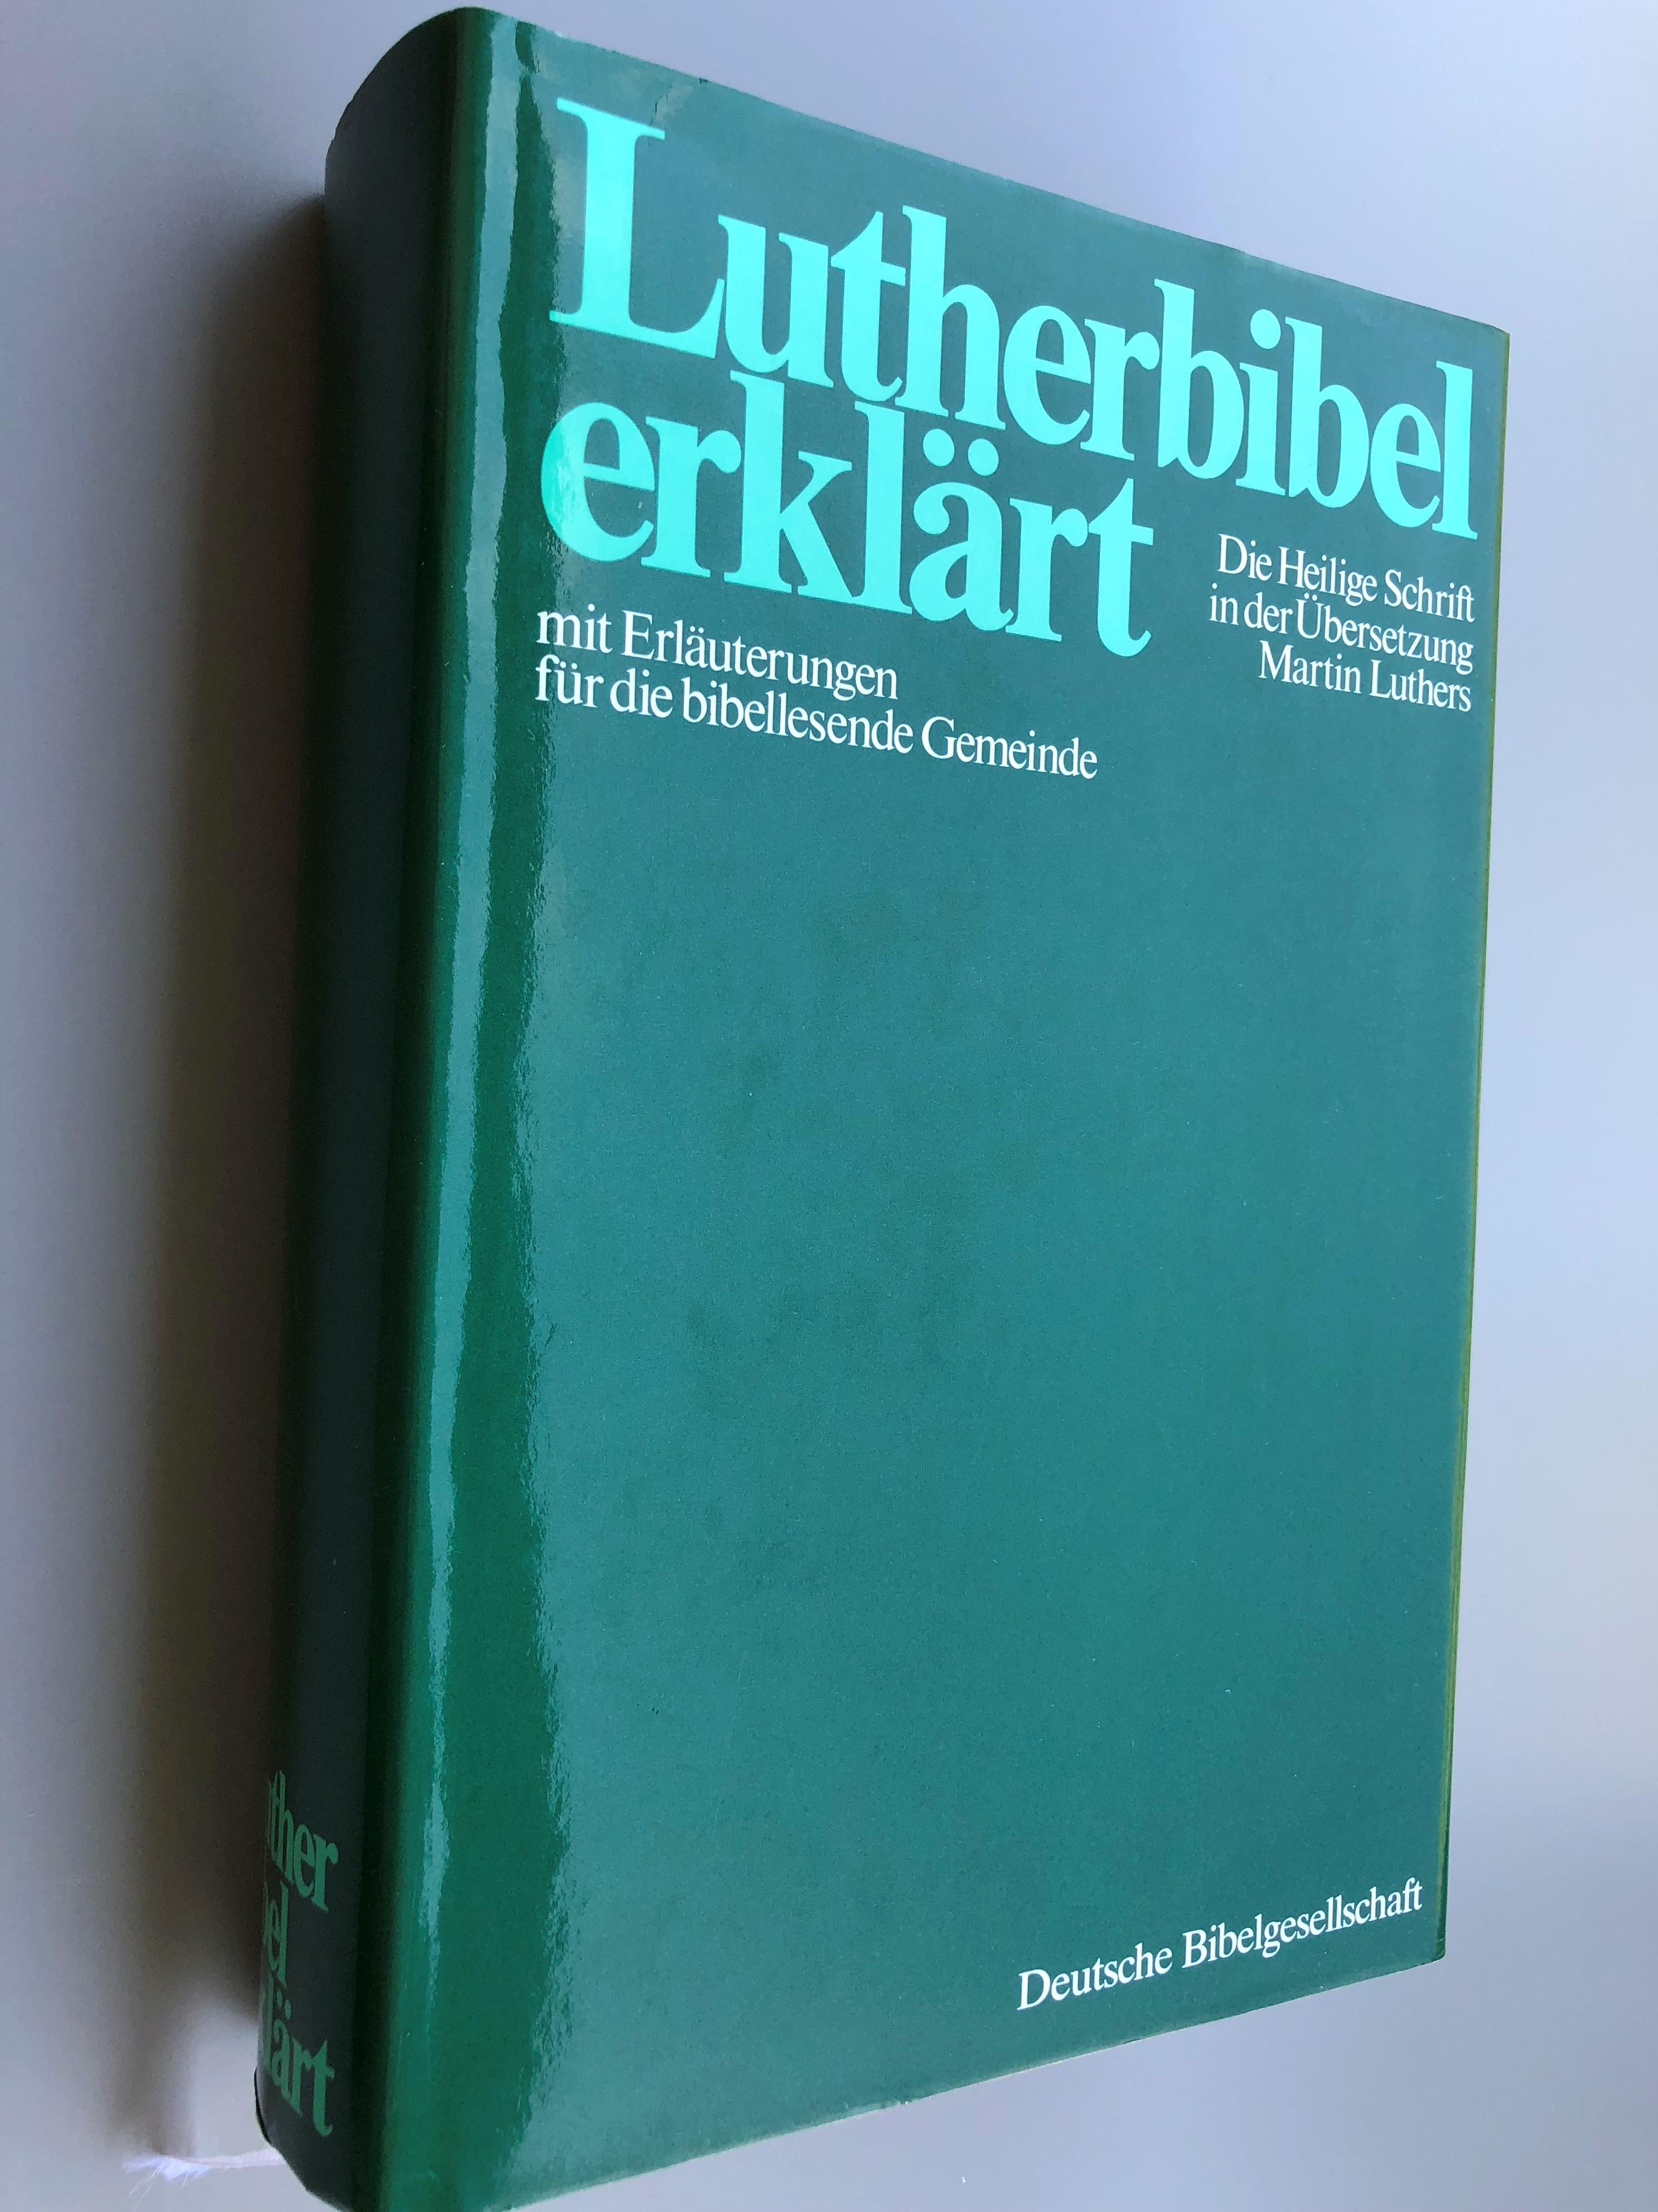 german-study-bible-explanation-1-.jpg